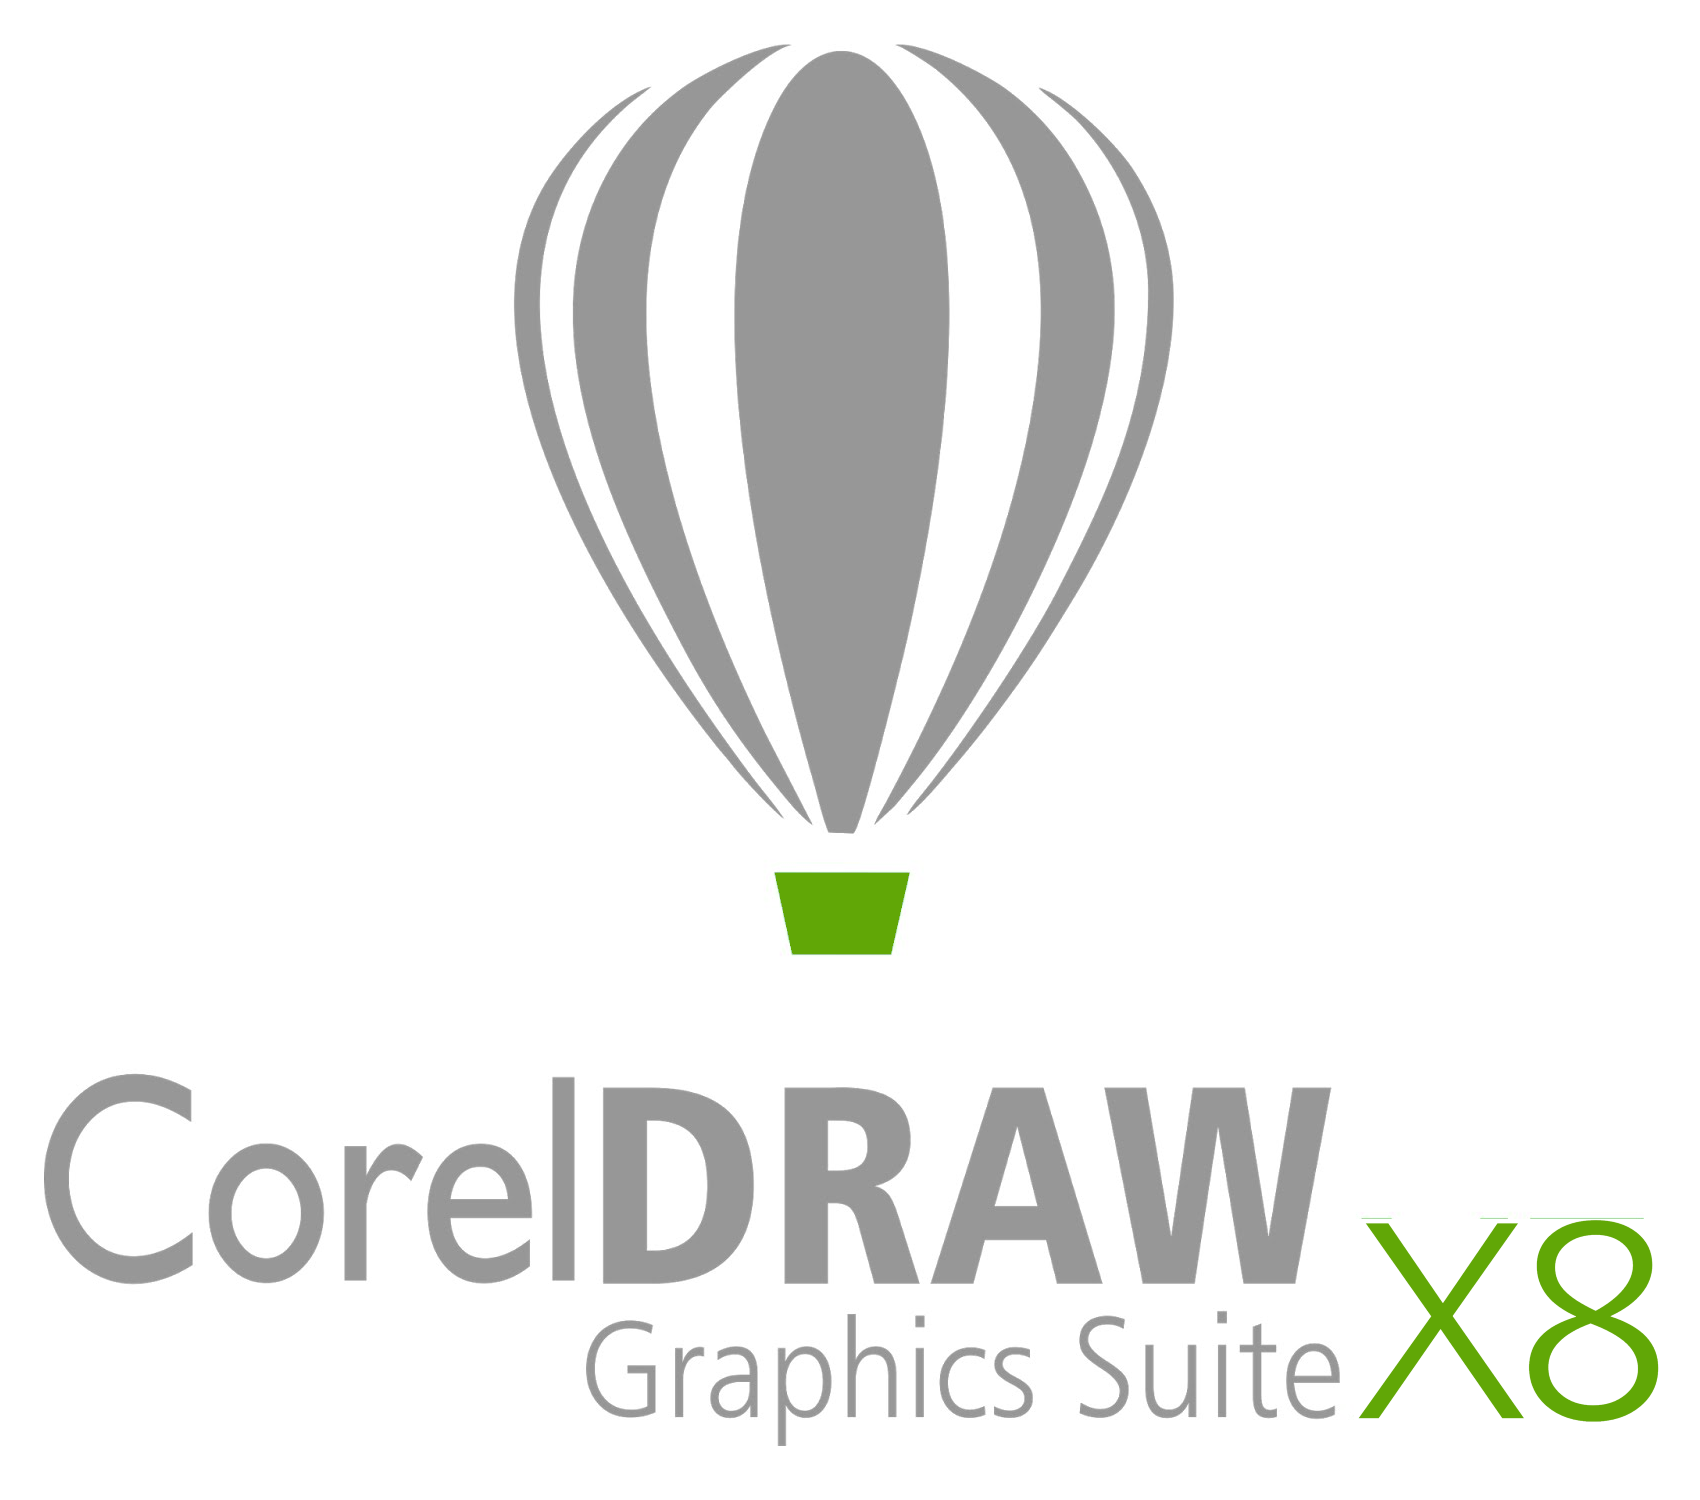 Coreldraw Logo Graphics Suite X8 Emblem 2 Logos Download